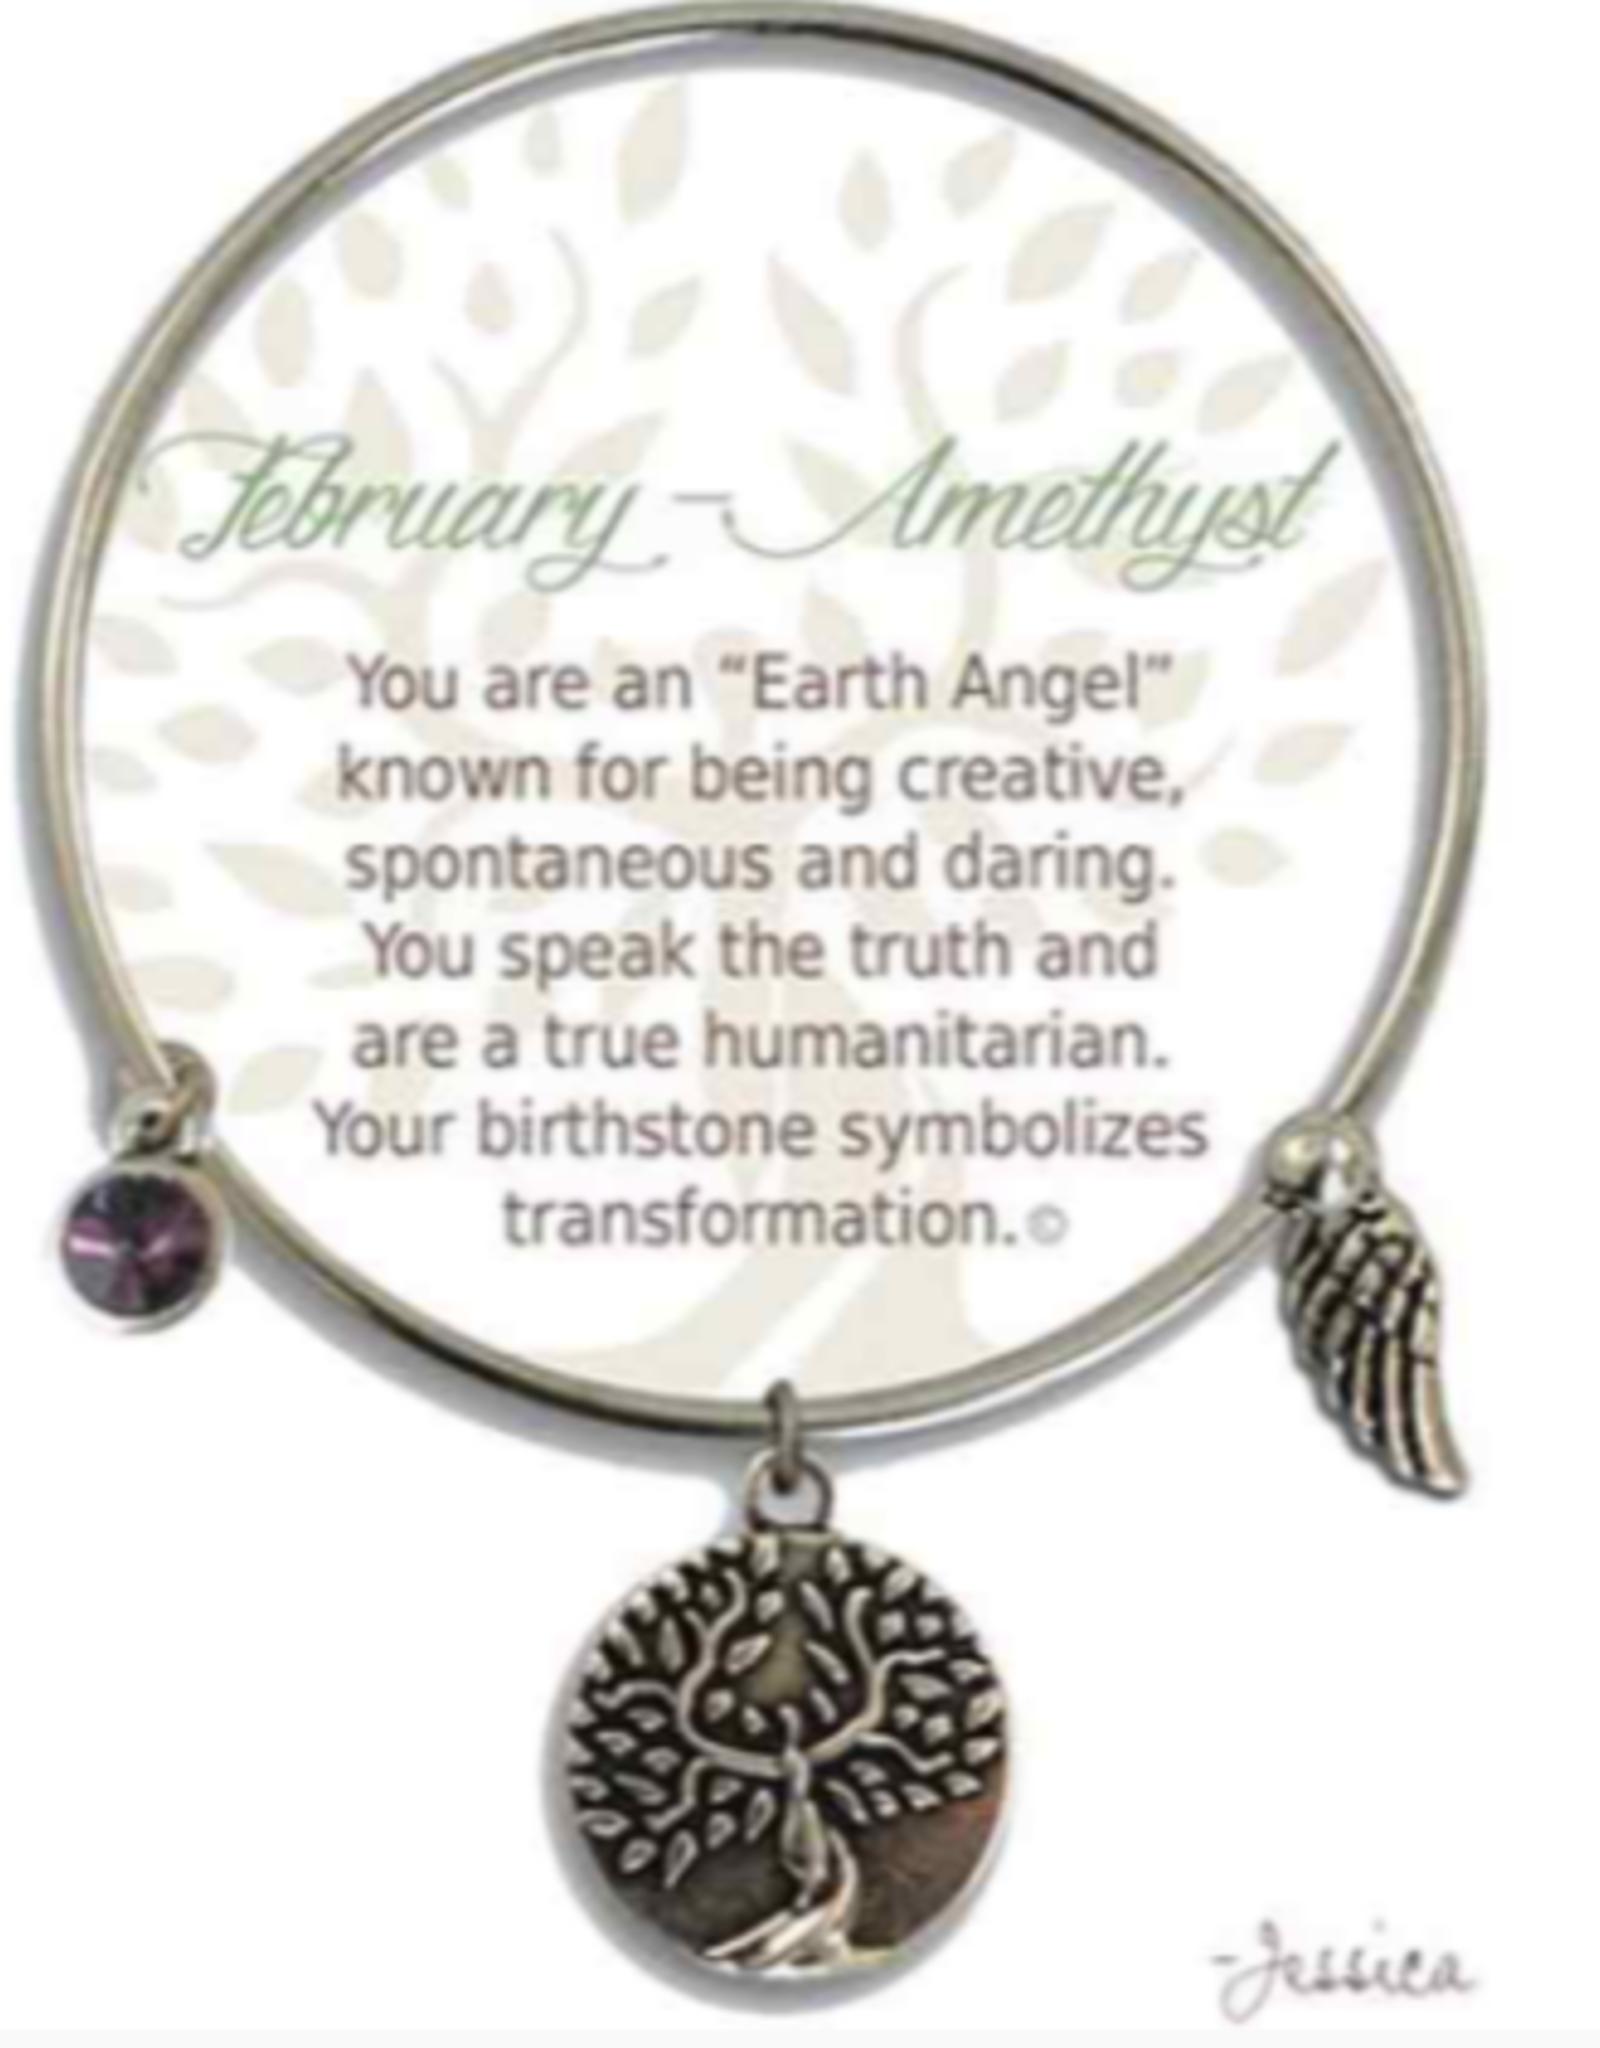 CLOCK IT TO YA EARTH ANGEL BRACELET - FEBRUARY: AMETHYST